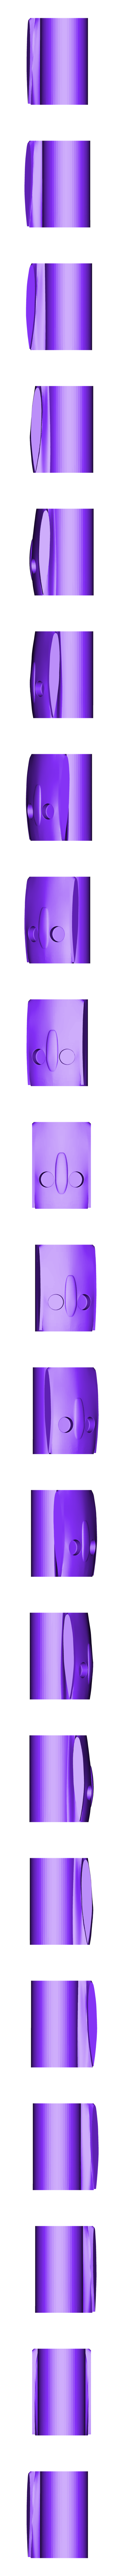 Mid2.STL Download STL file Phenom 300 • Template to 3D print, Eduardohbm